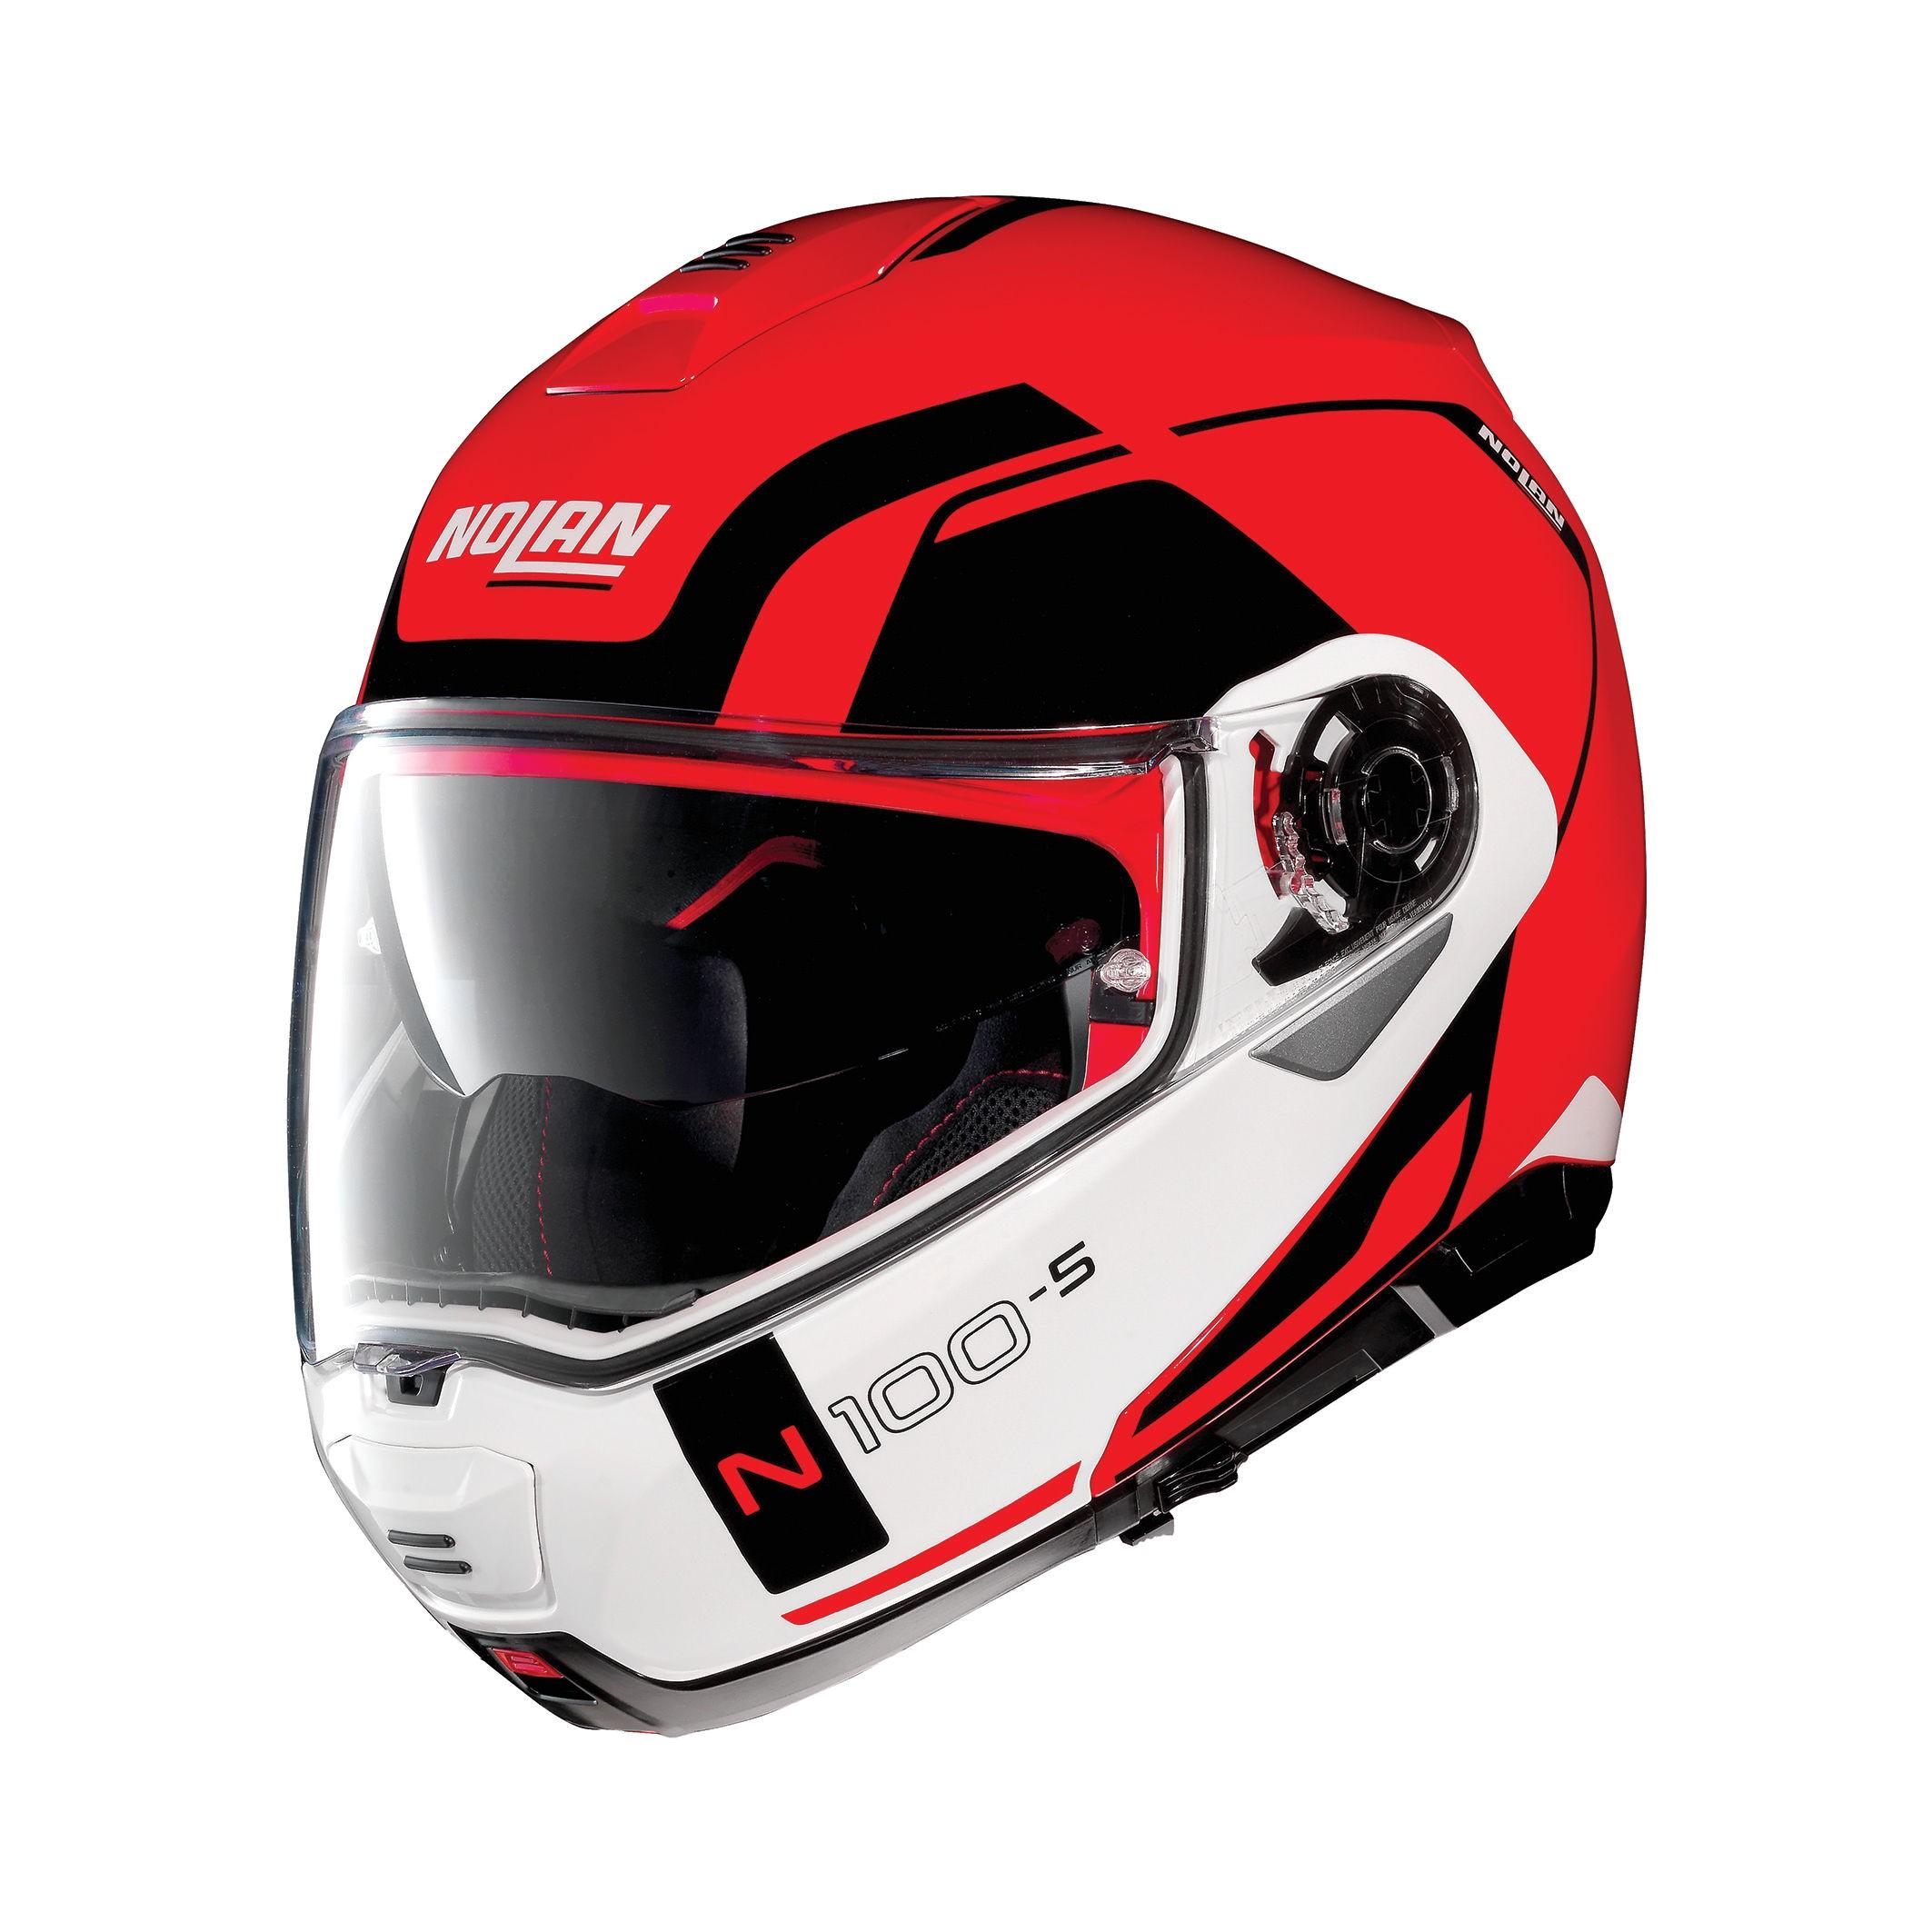 Moto helma Nolan N100-5 Consistency N-Com Corsa Red 23